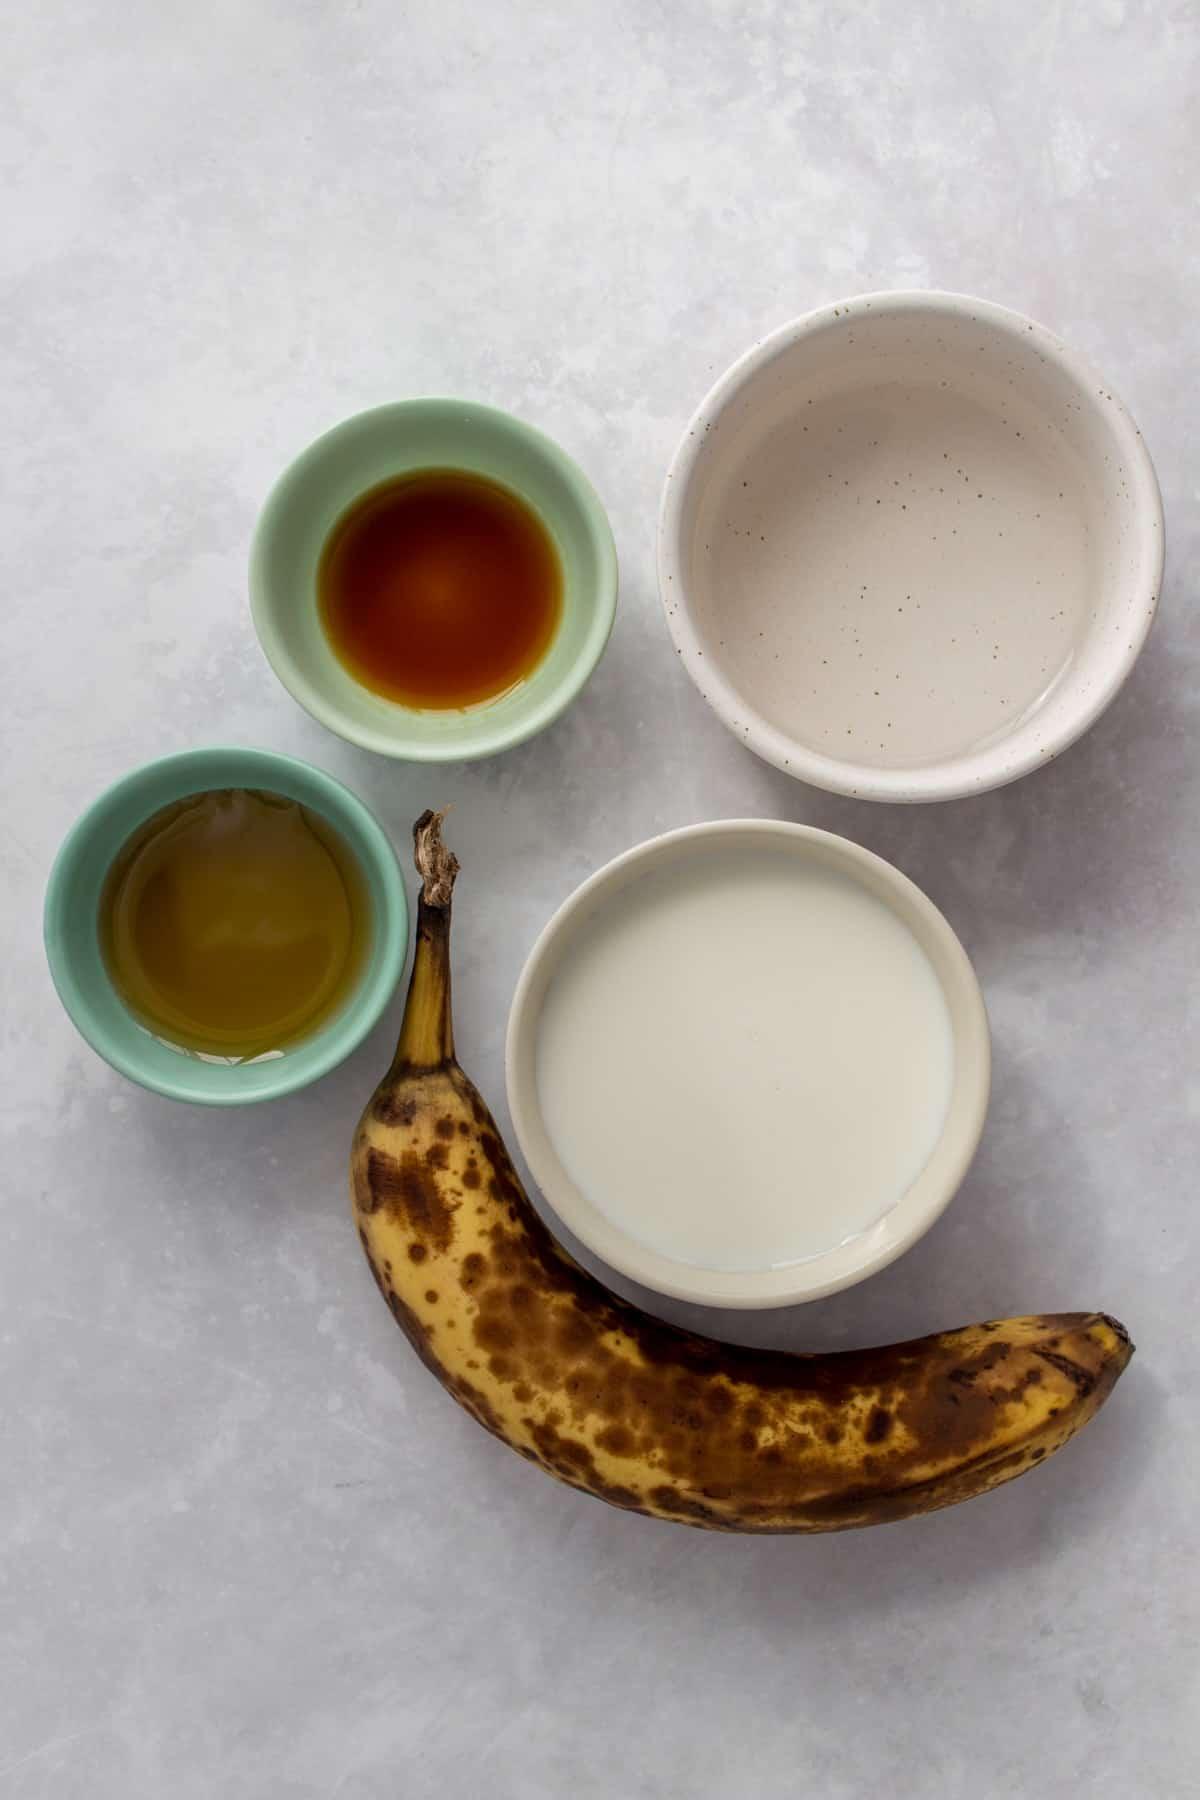 Ingredients needed to make homemade banana milk.